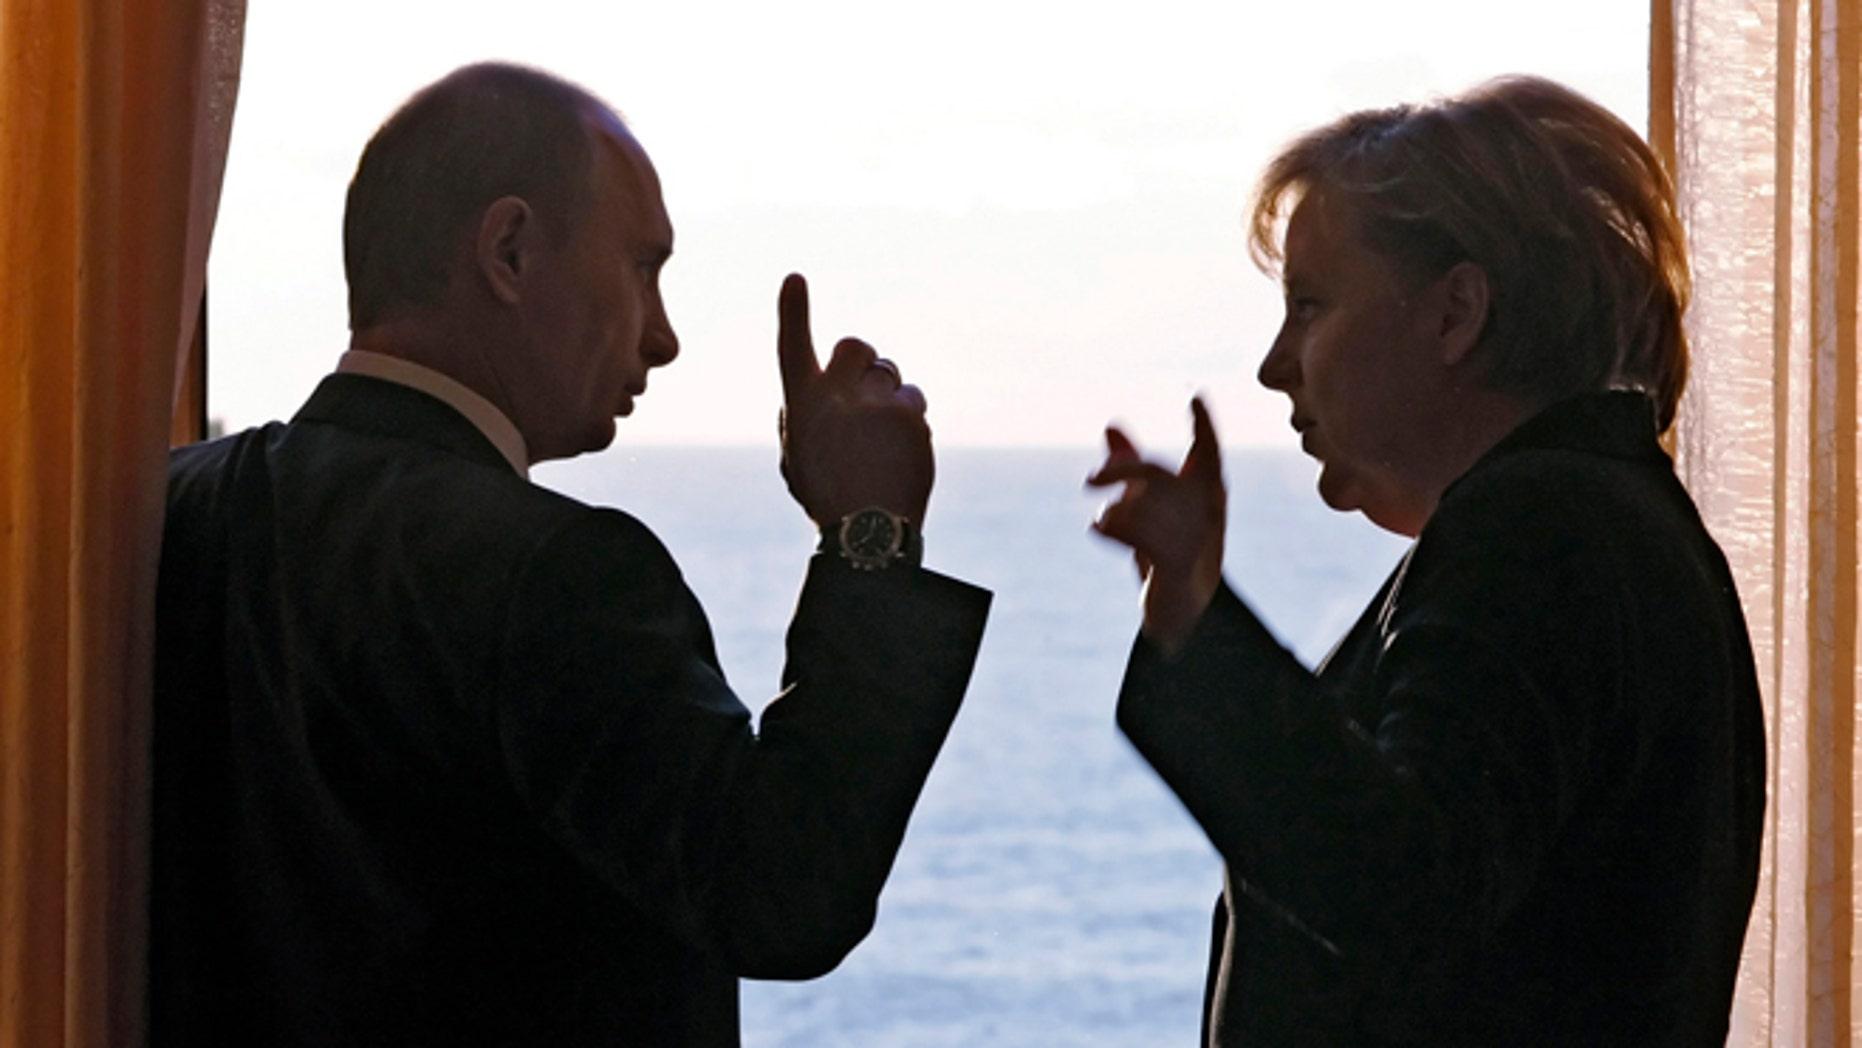 In this Sunday, Jan. 21, 2007 pool file photo German Chancellor Angela Merkel and Russian President Vladimir Putin speak during their meeting in Putin's residence in the Russian Black Sea resort of Sochi.